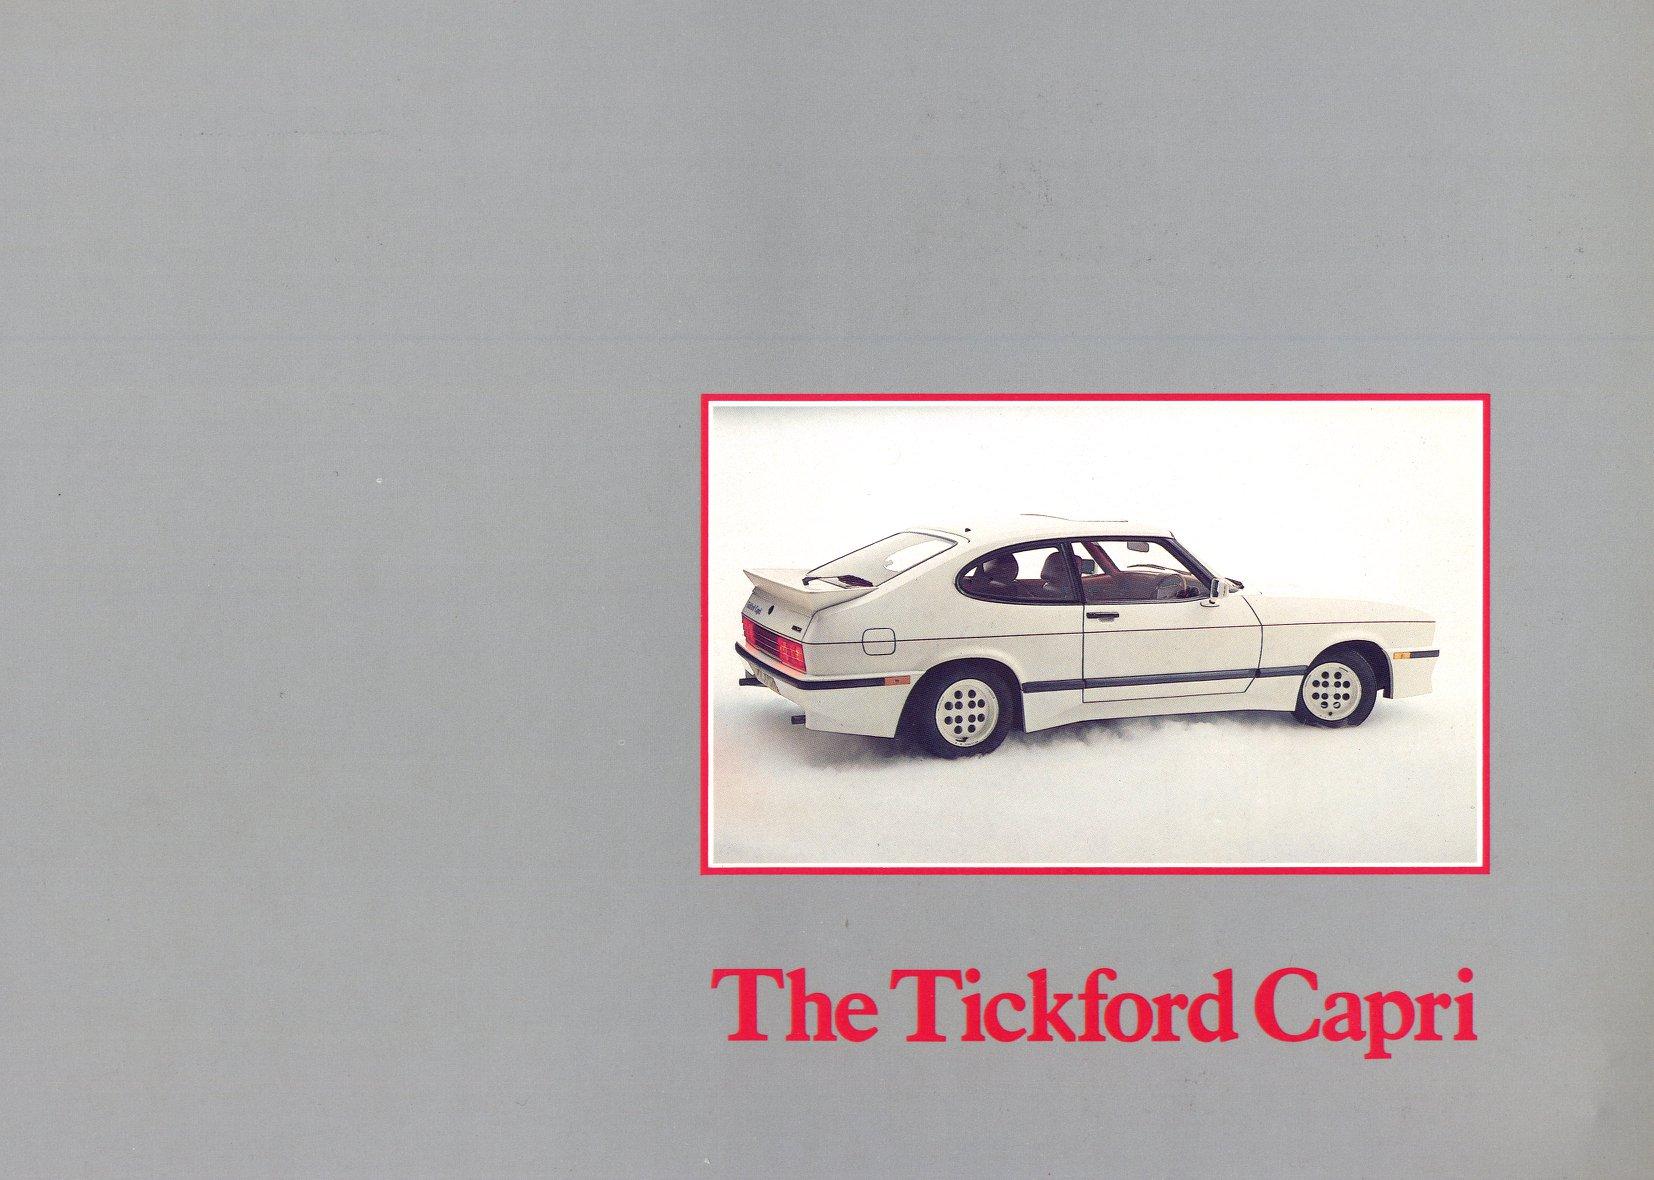 Tickford-brosjyre-10